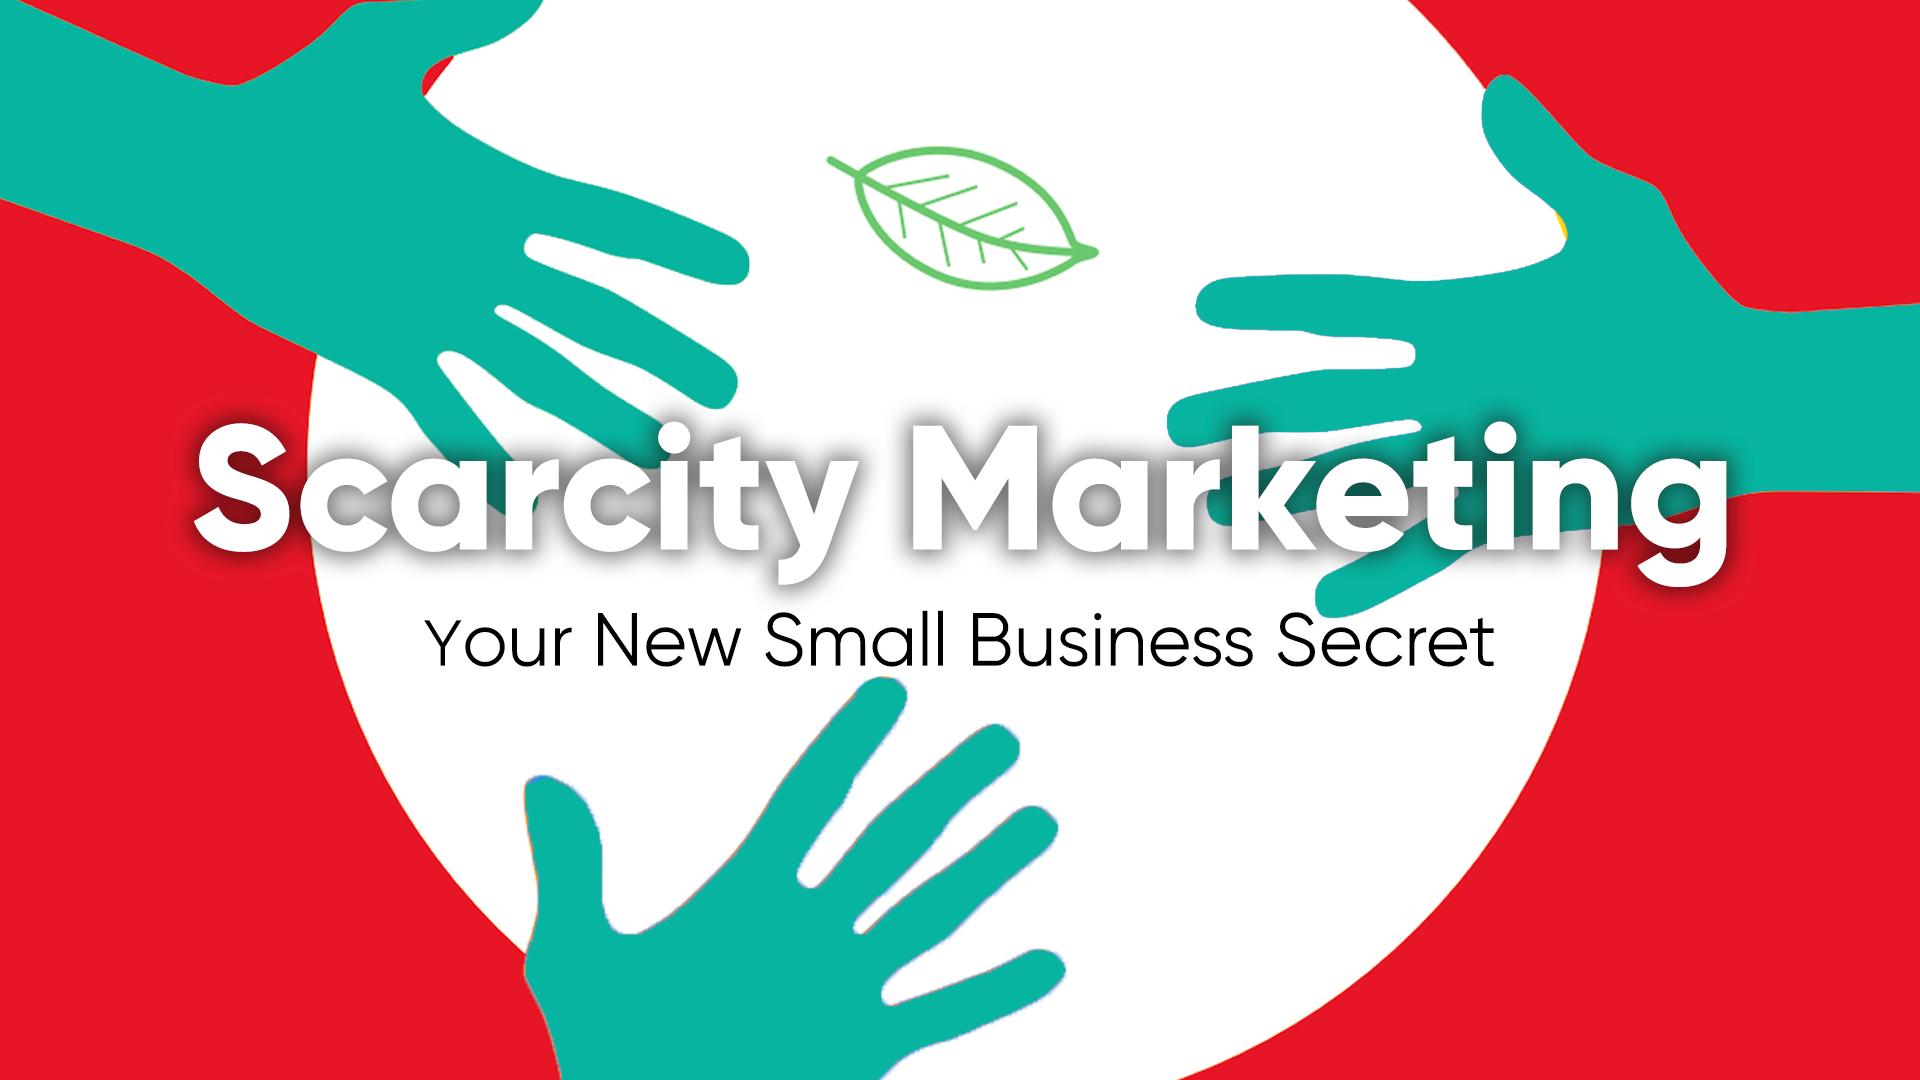 scarcity marketing, what is scarcity marketing, exclusivity marketing, scarcity marketing tips, scarcity marketing how to, scarcity marketing 2021, online business tips, scarcity business tips, ecommerce marketing, ecommerce strategies